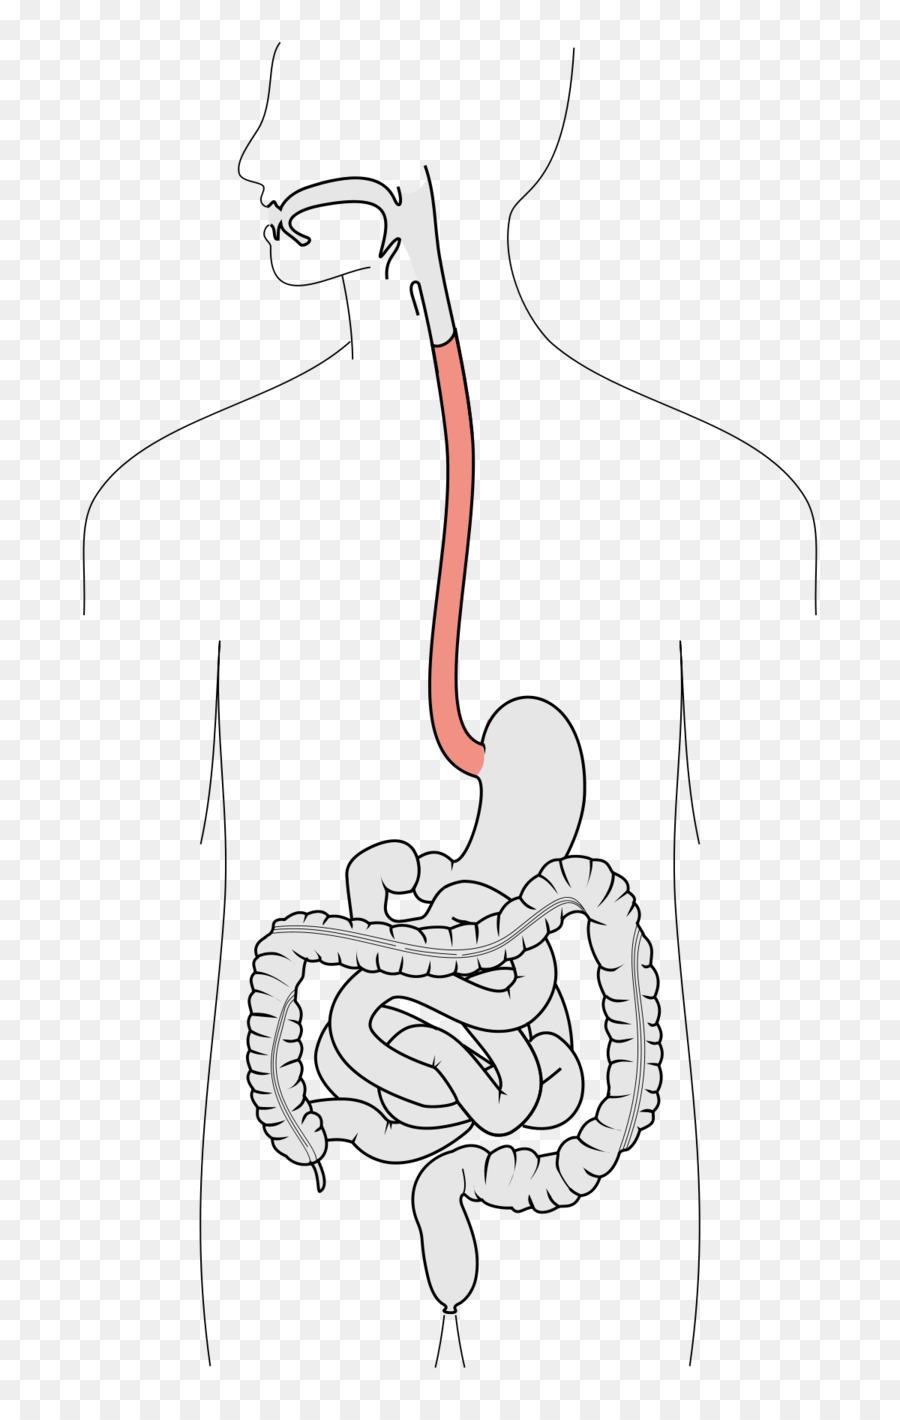 Barrett\'s esophagus Swallowing Function Human digestive system ...